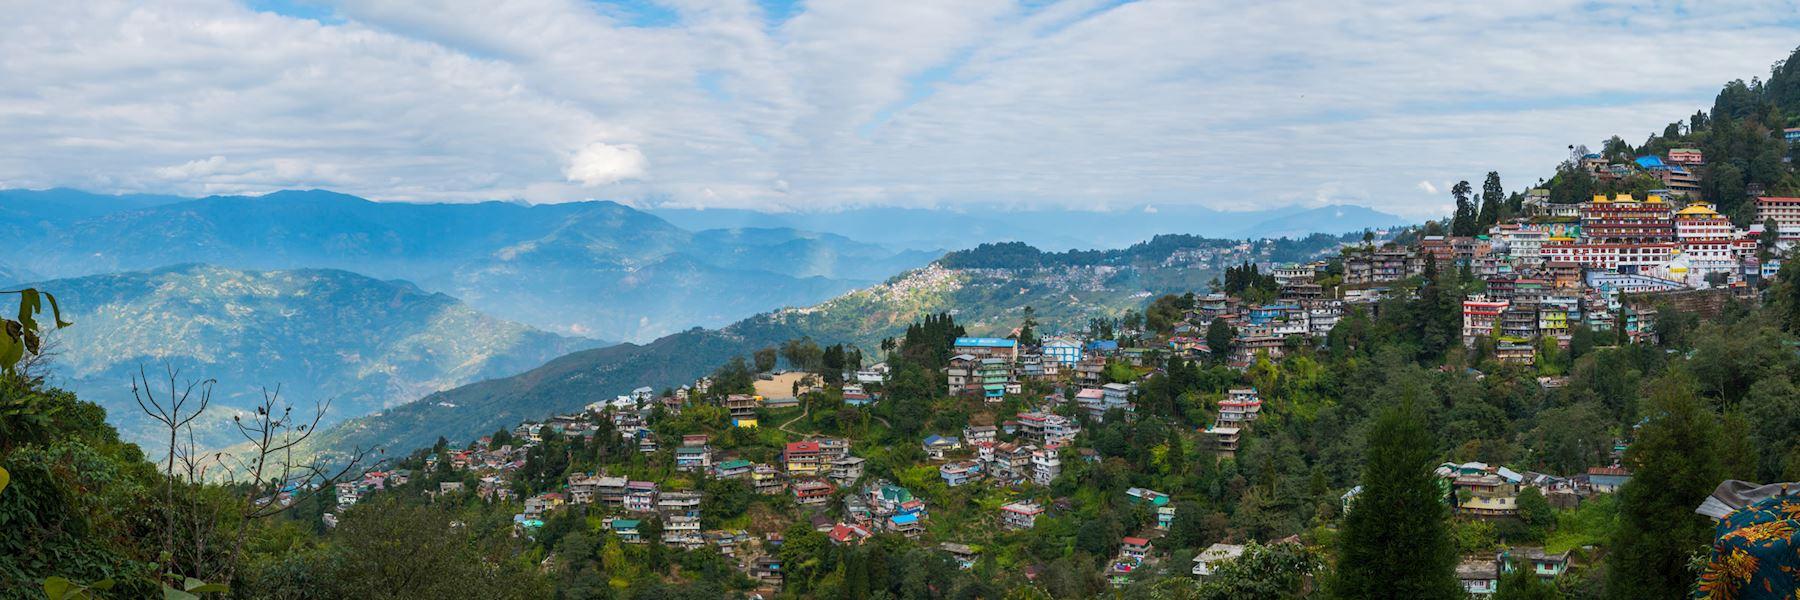 Visit Darjeeling, India